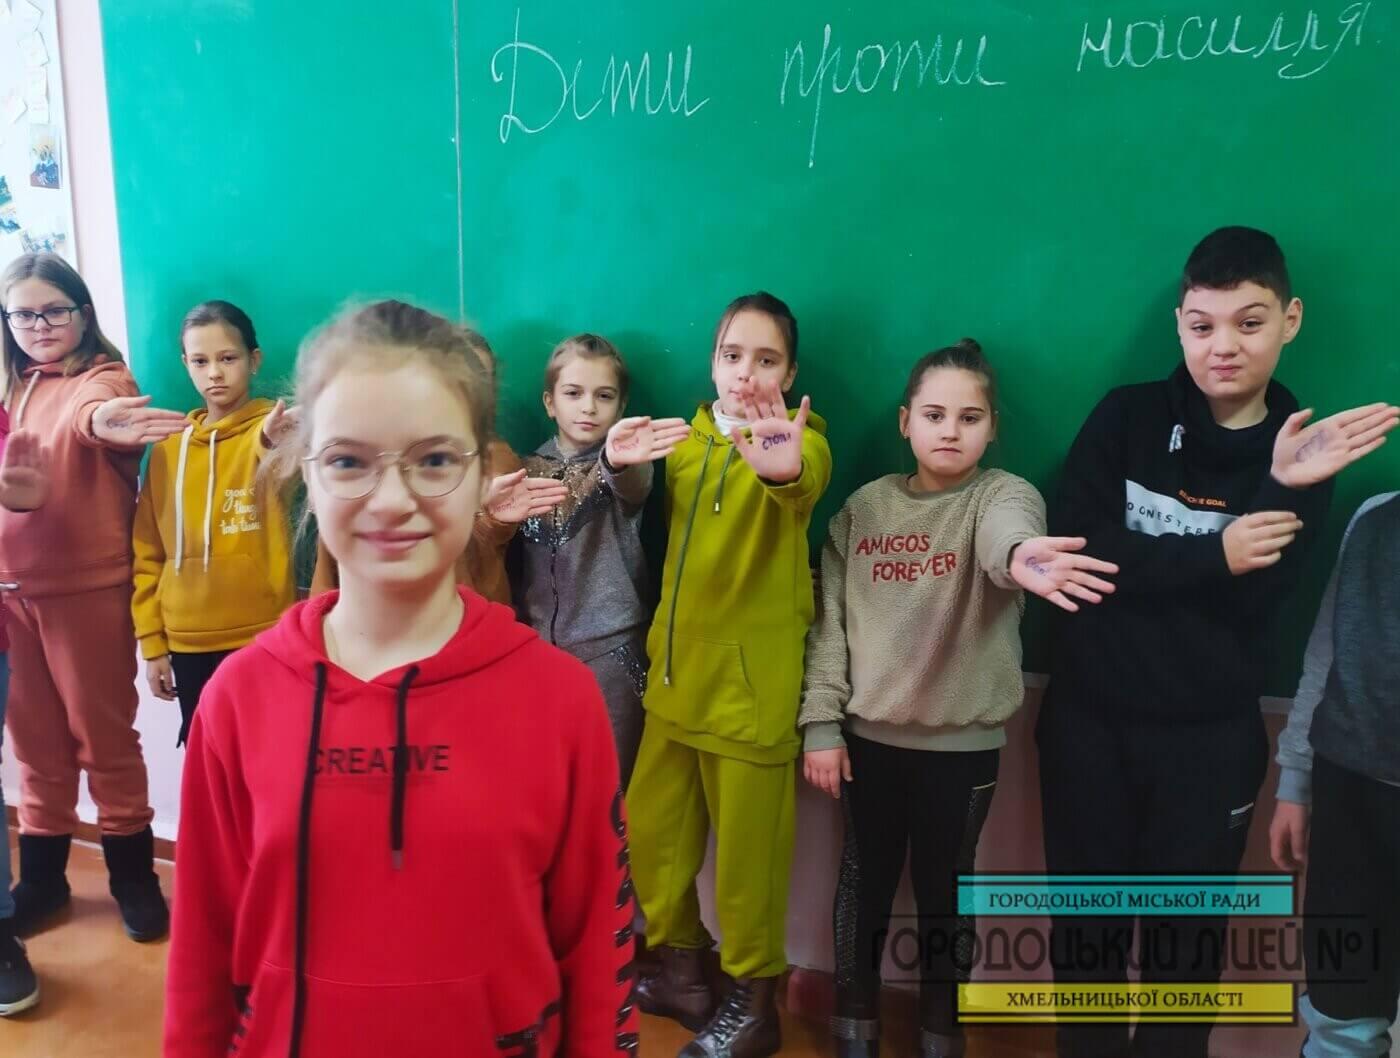 zobrazhennya viber 2020 12 09 21 13 231 1400x1058 - Діти проти насилля